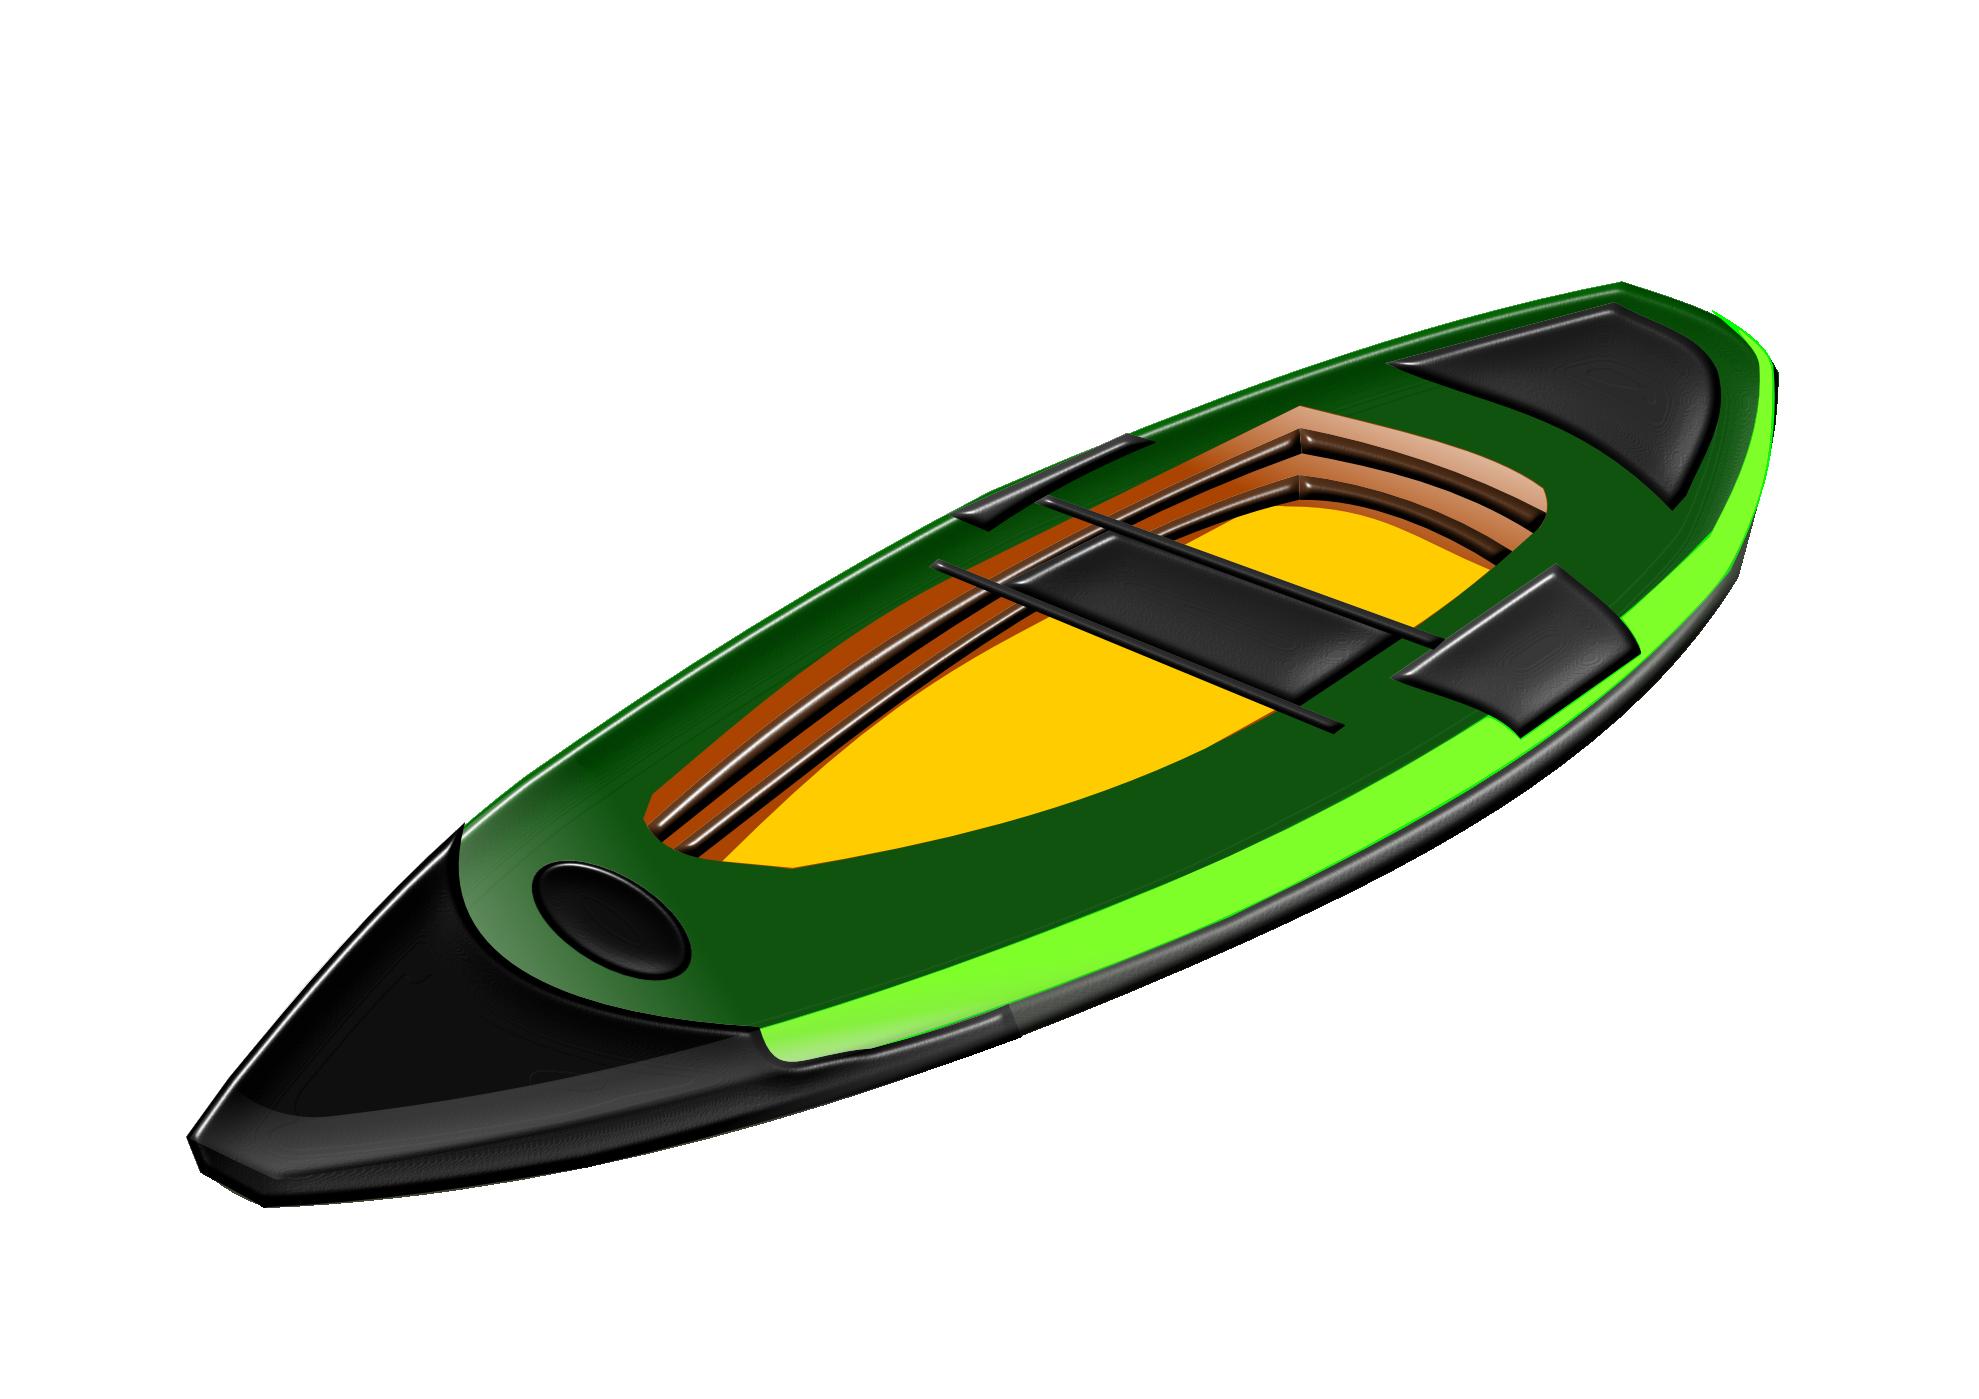 Download Canoe svg, Download Canoe svg for free 2019